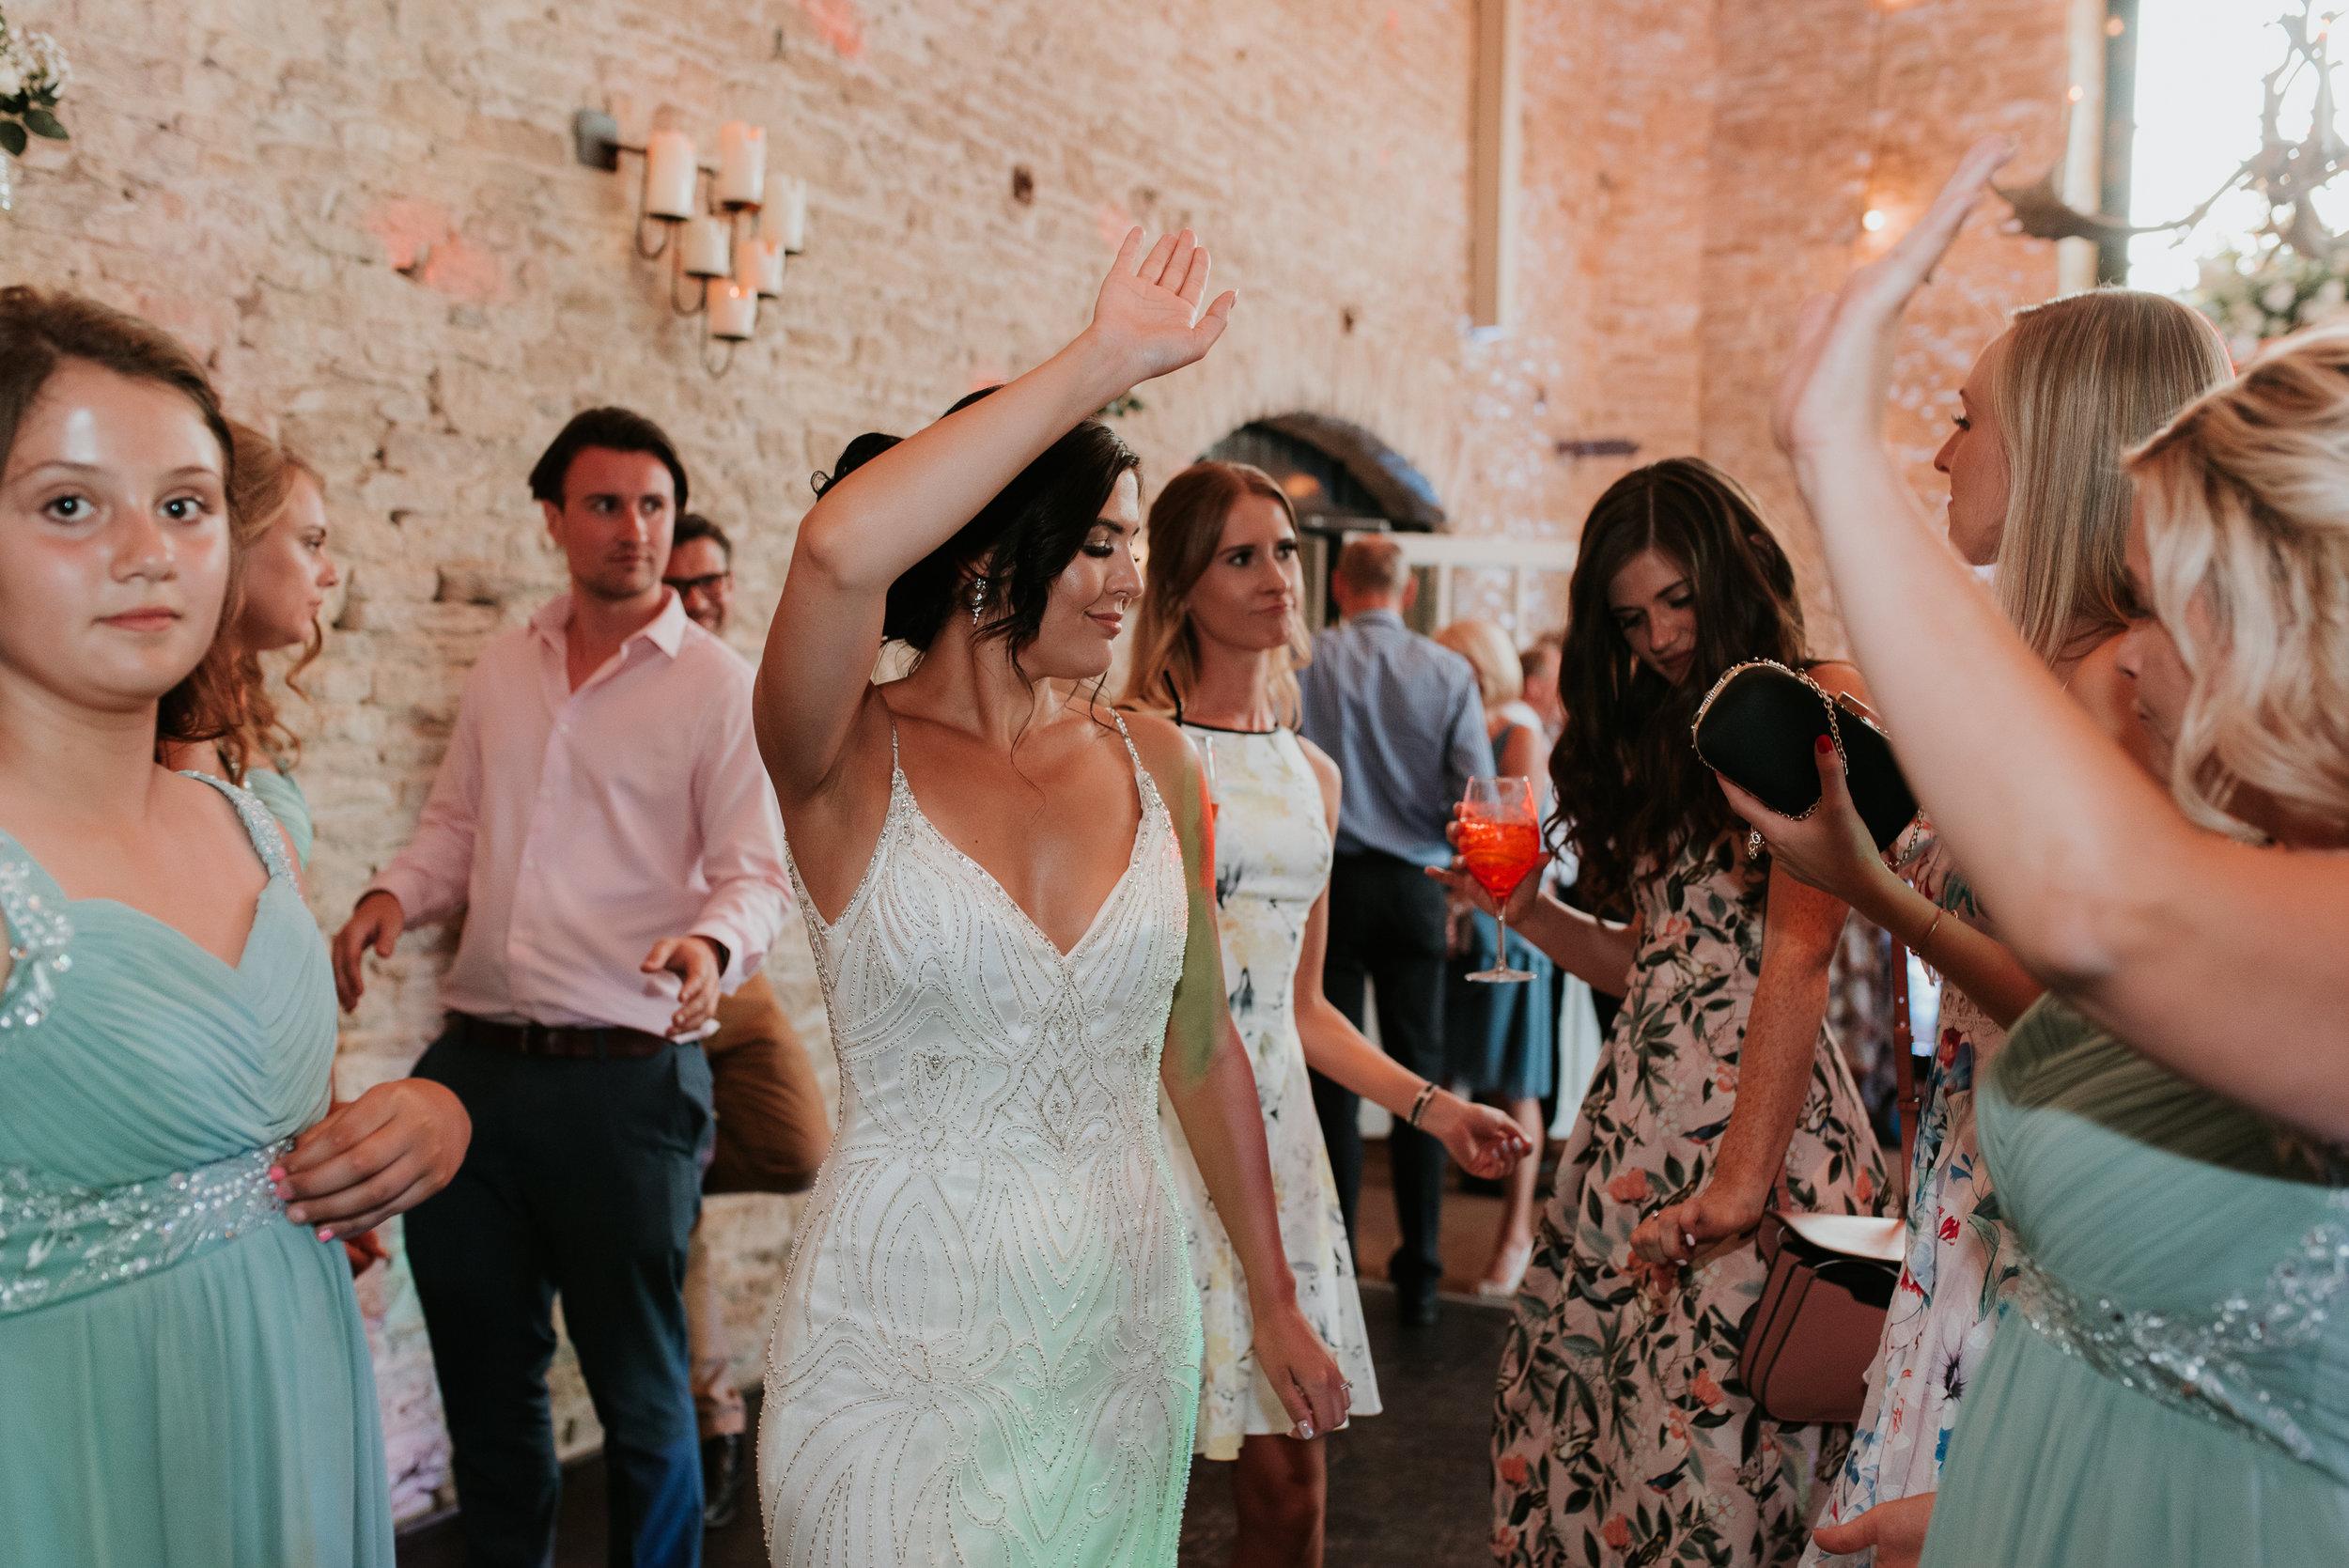 Oxfordshire-wedding-photographer-91.jpg